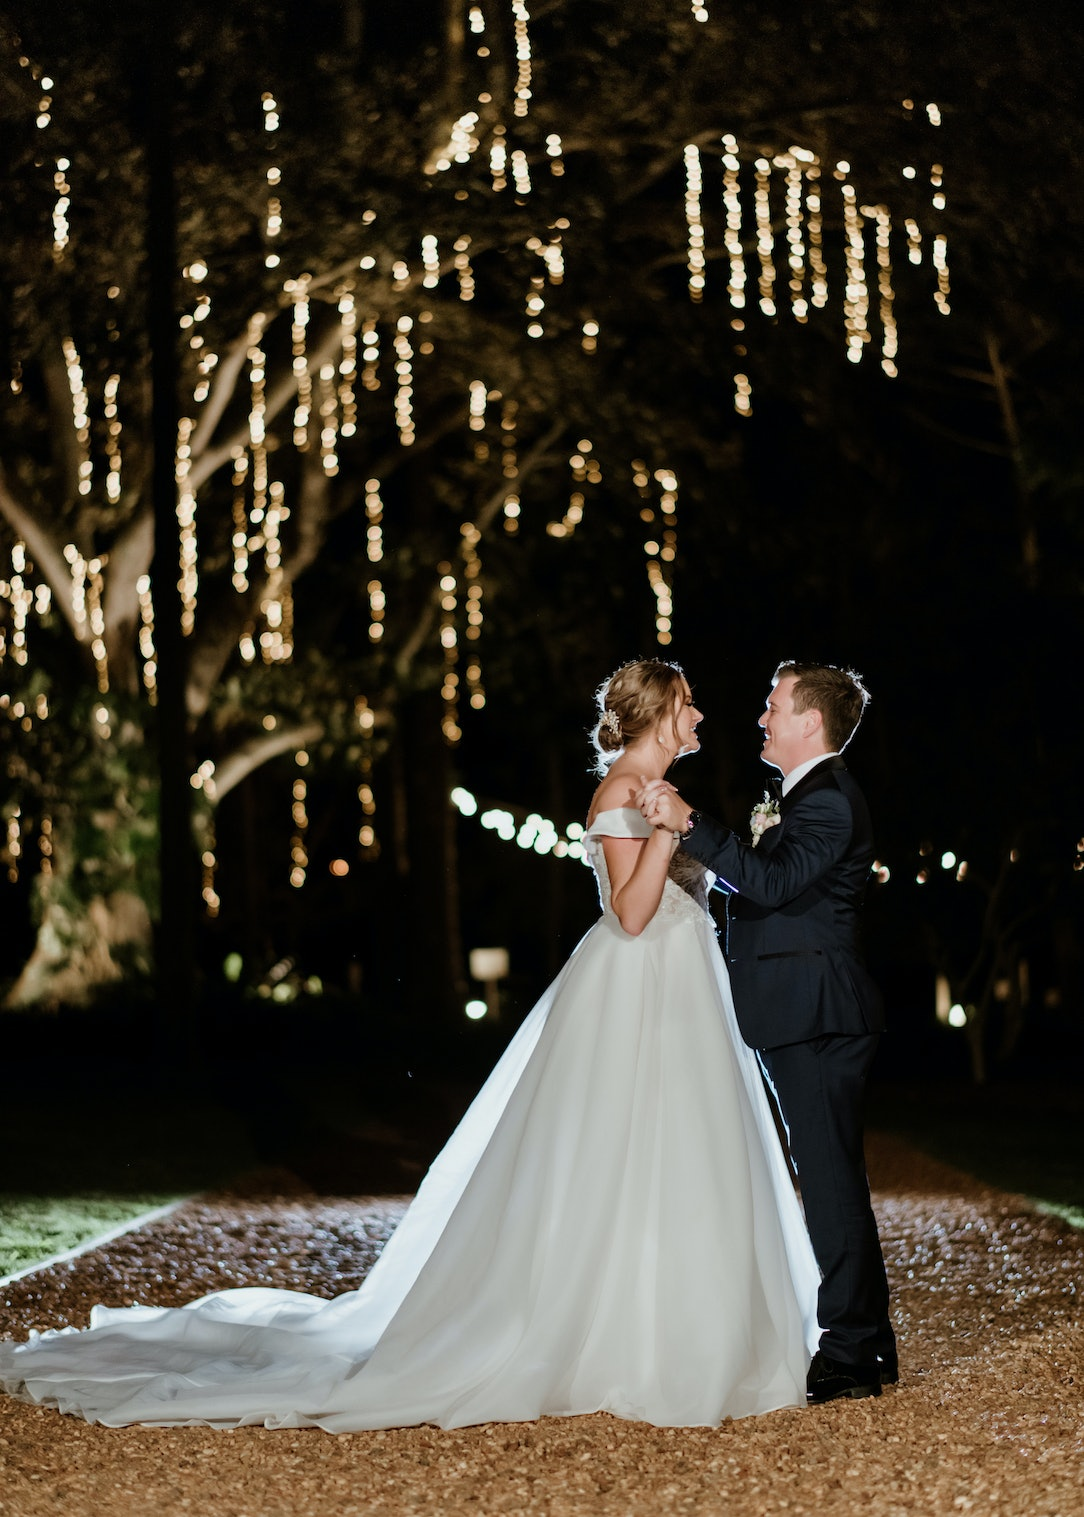 Bride and groom dancing at night